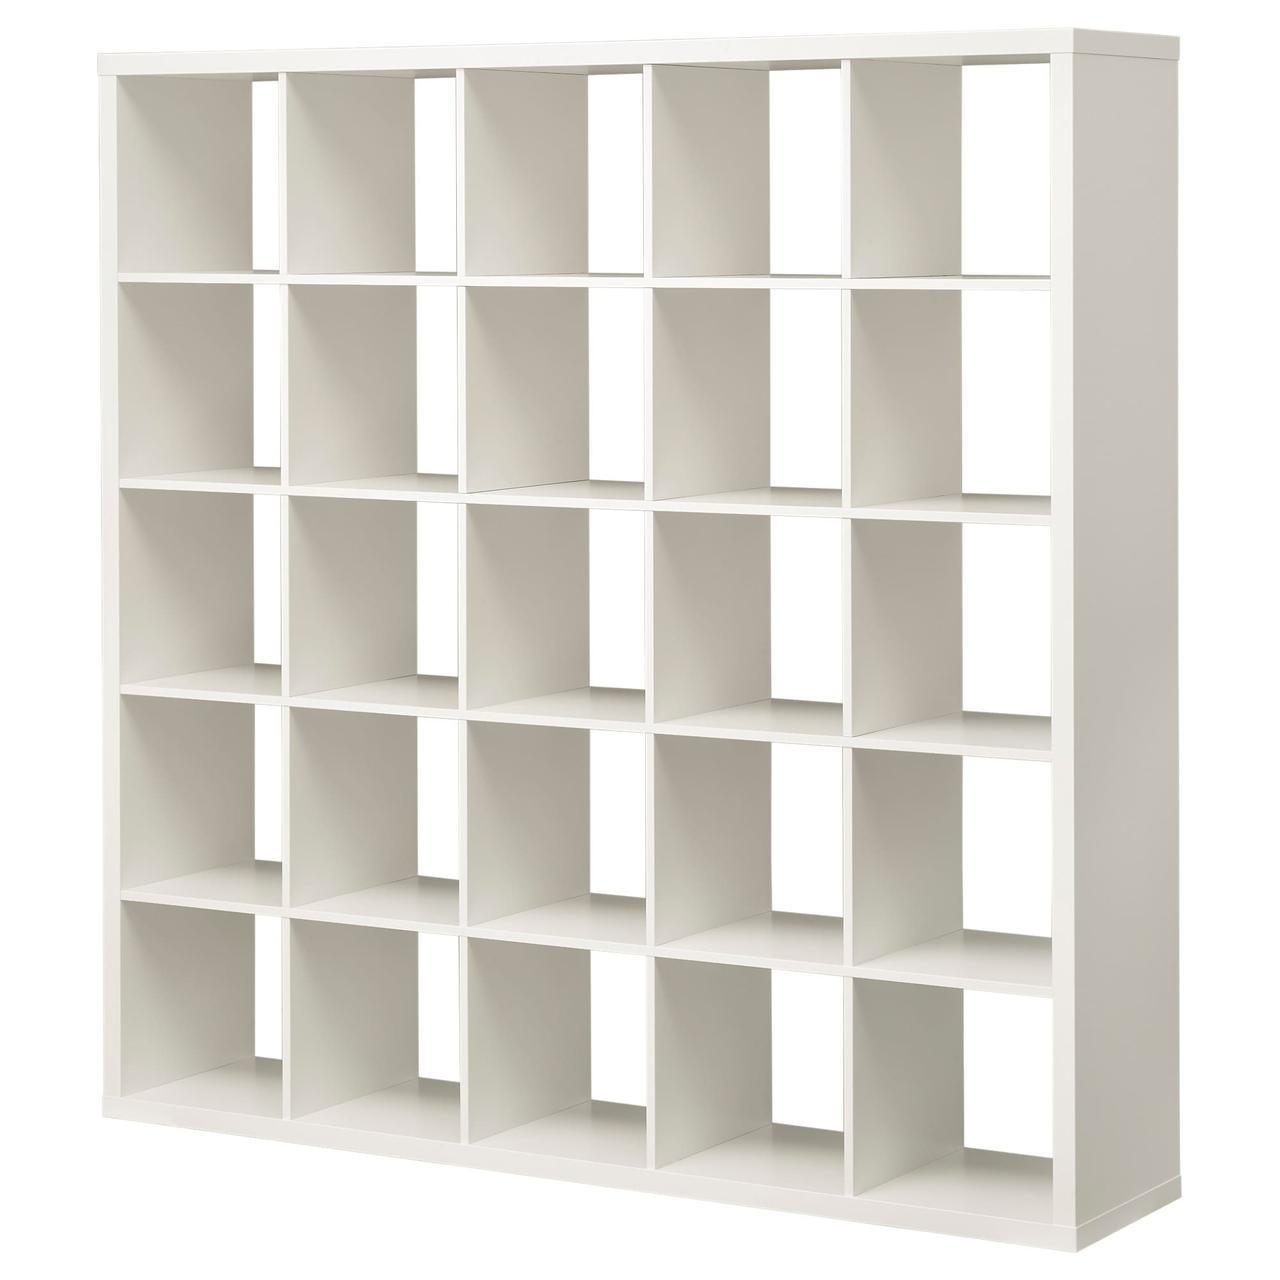 ✅ IKEA KALLAX (703.015.37) Стеллаж